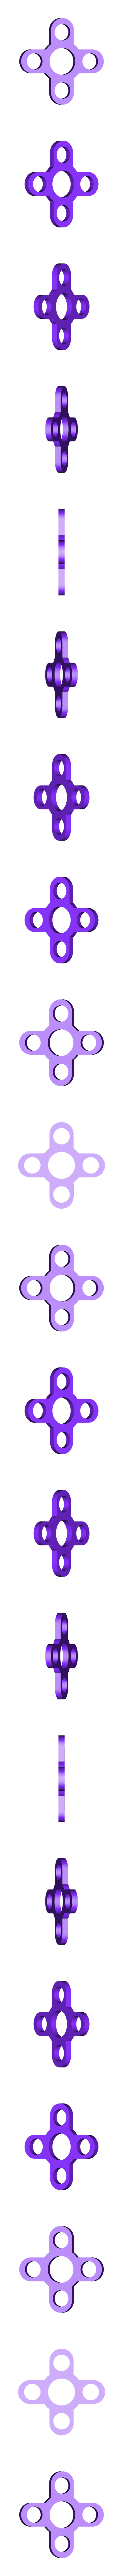 11xx_Soft_Mount_Pad.stl Download free STL file 11XX 22XX 14XX 13XX TPU Soft Mount Pads Quadcopter Vibration Dampener Every Size • 3D printing design, BananaScience